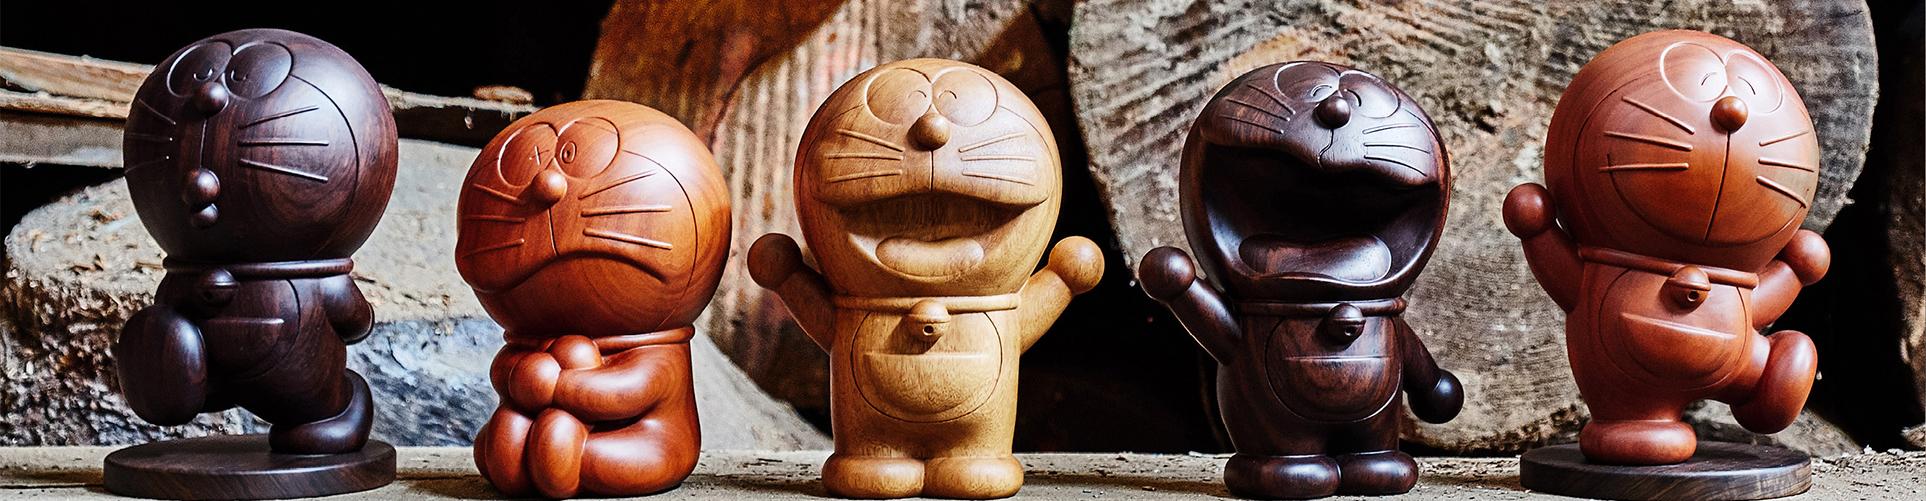 Doraemon_Crafted